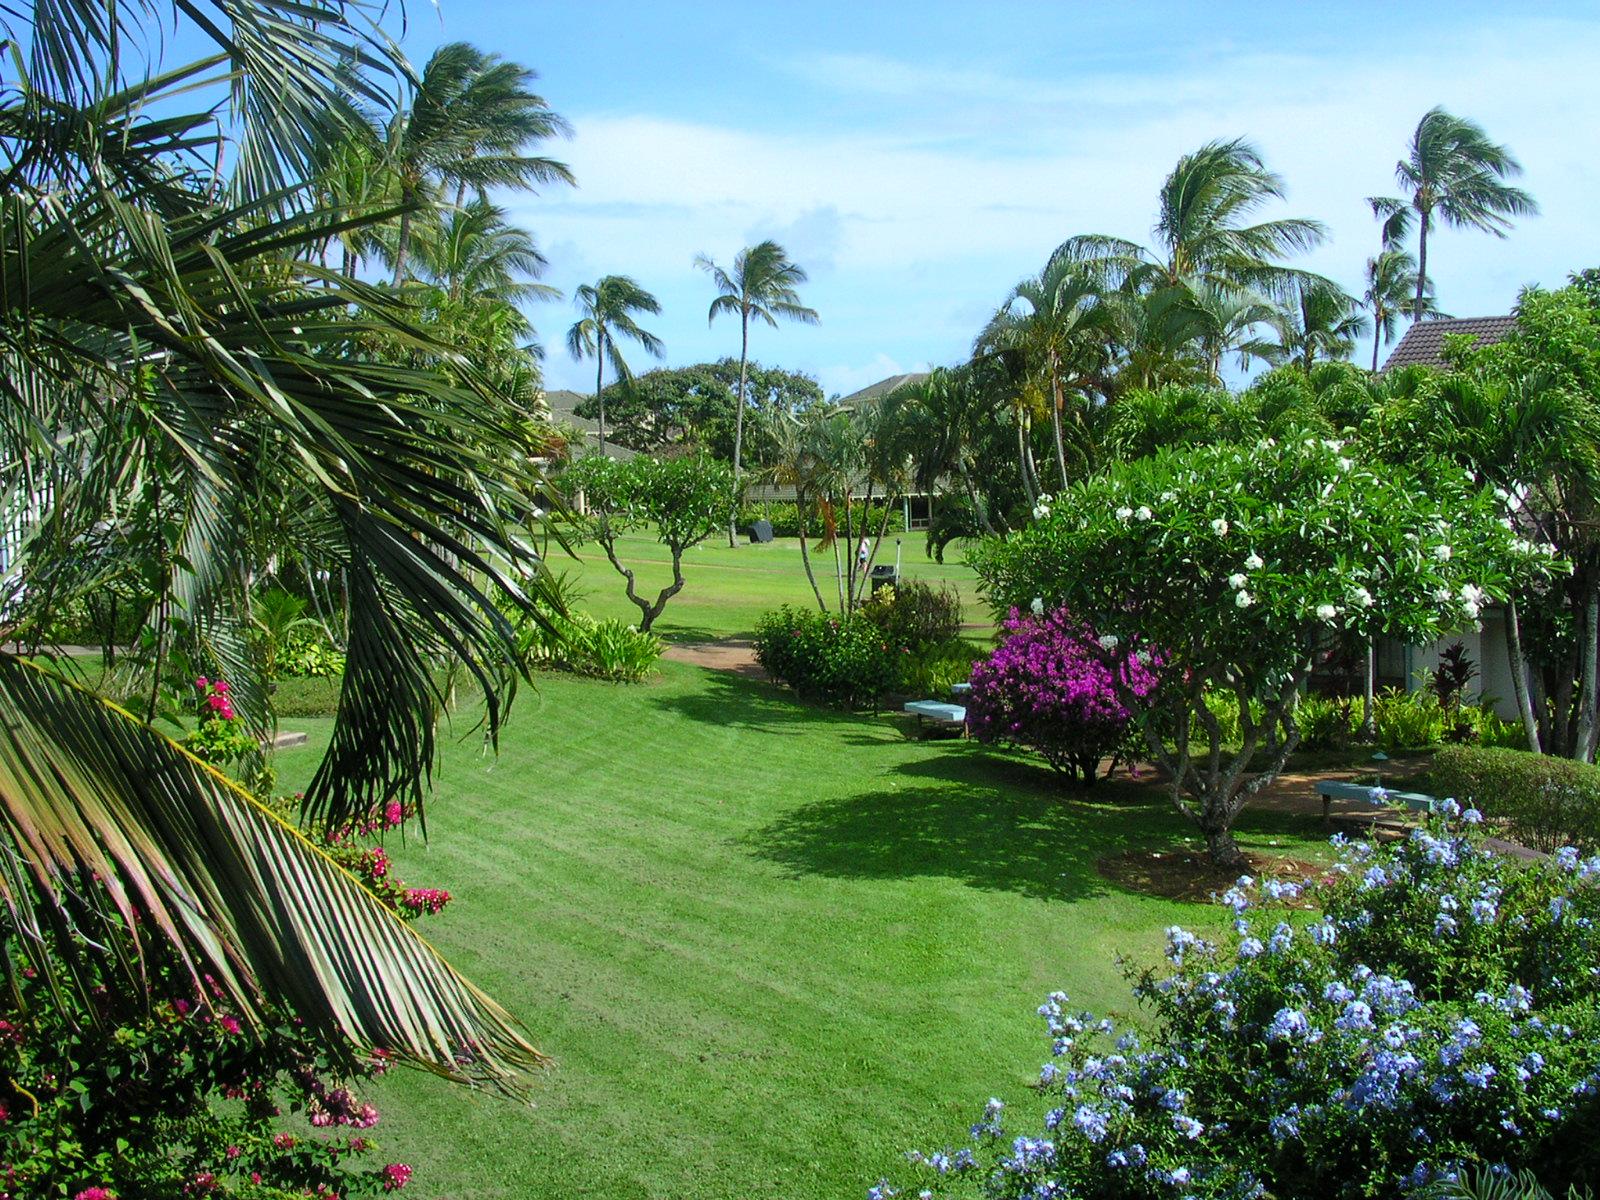 Hawaiian Garden Of Eden Available For 20m American Luxury